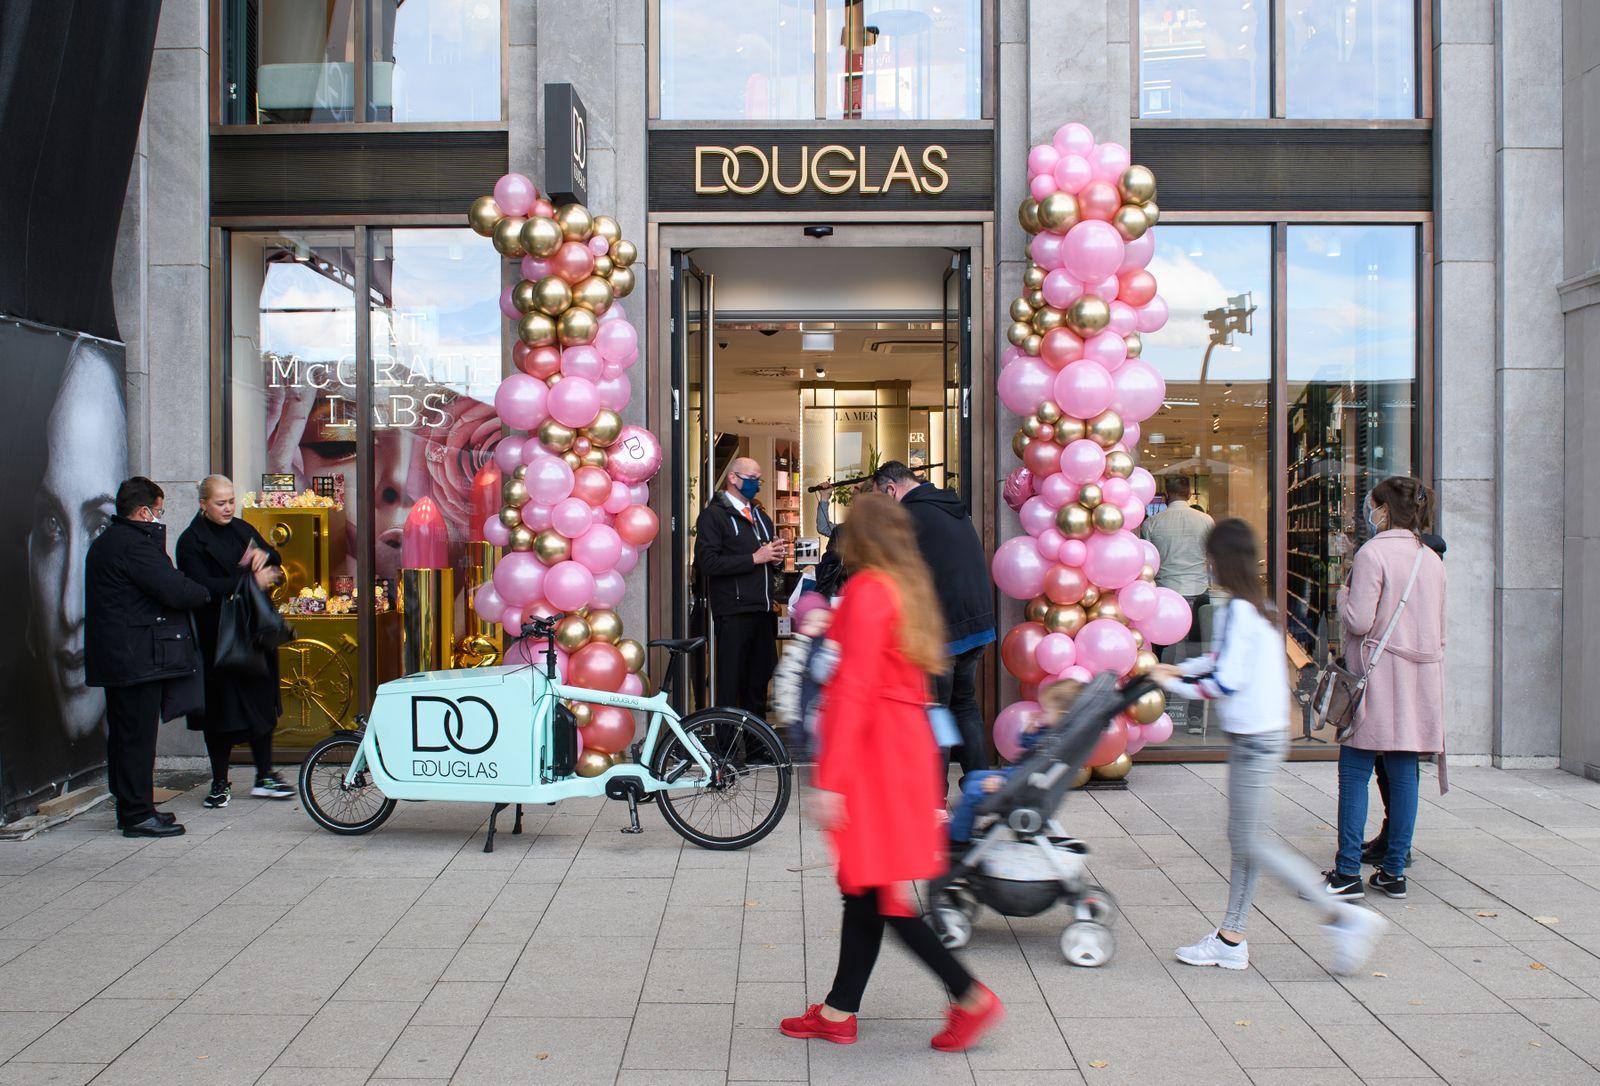 Douglas eröffnet Filiale am Jungfernstieg